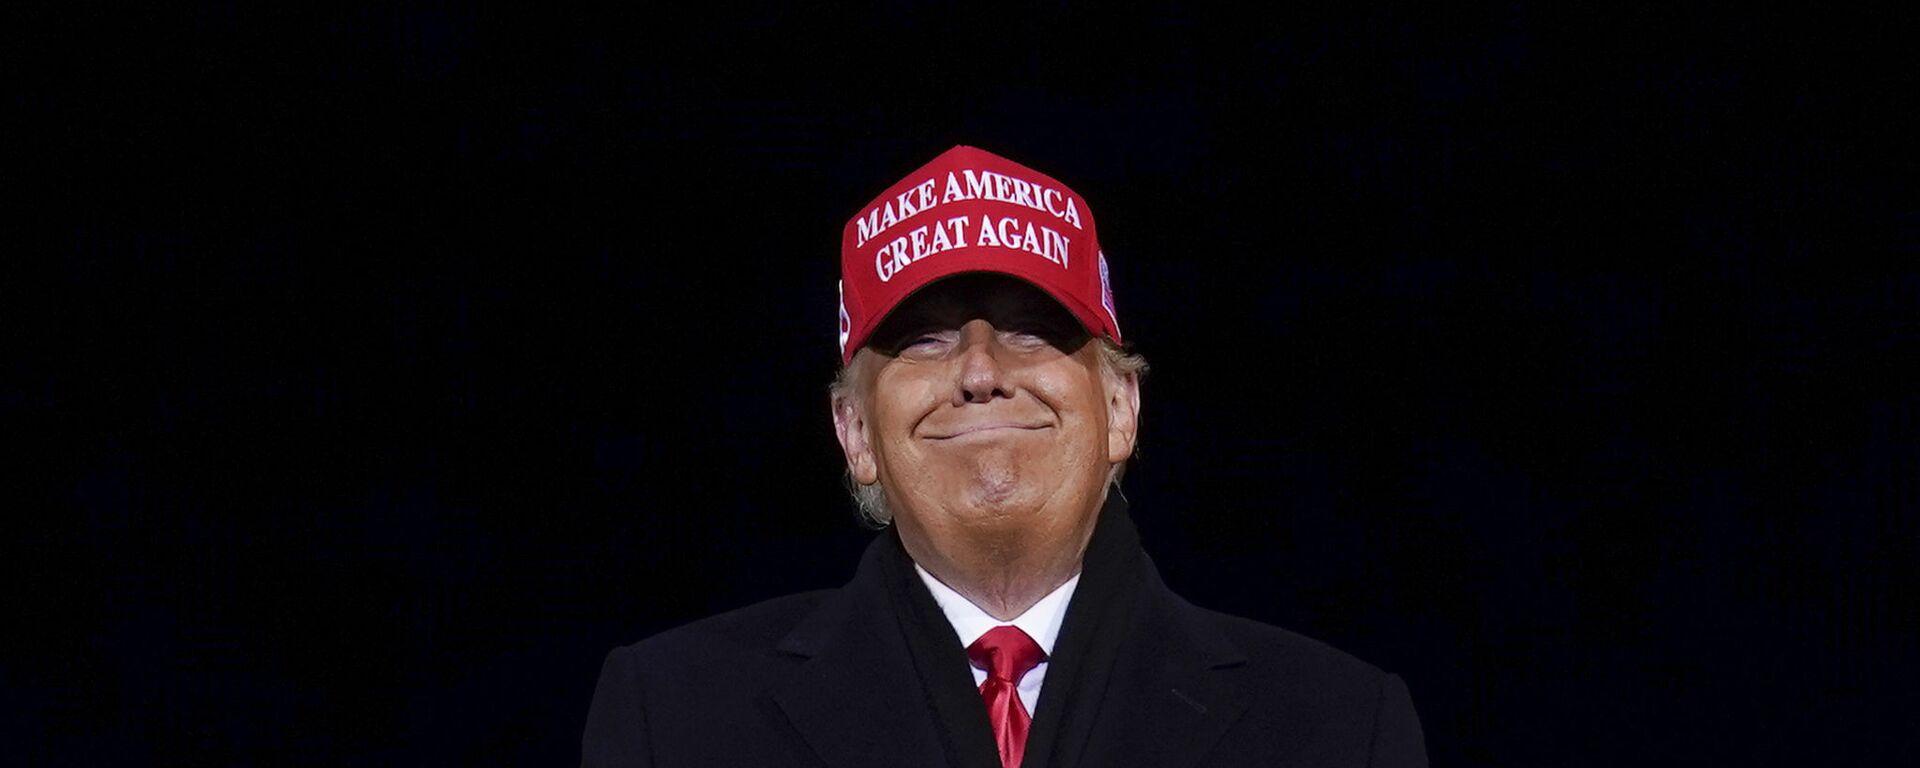 Президент Дональд Трамп улыбается - Sputnik Таджикистан, 1920, 15.02.2021